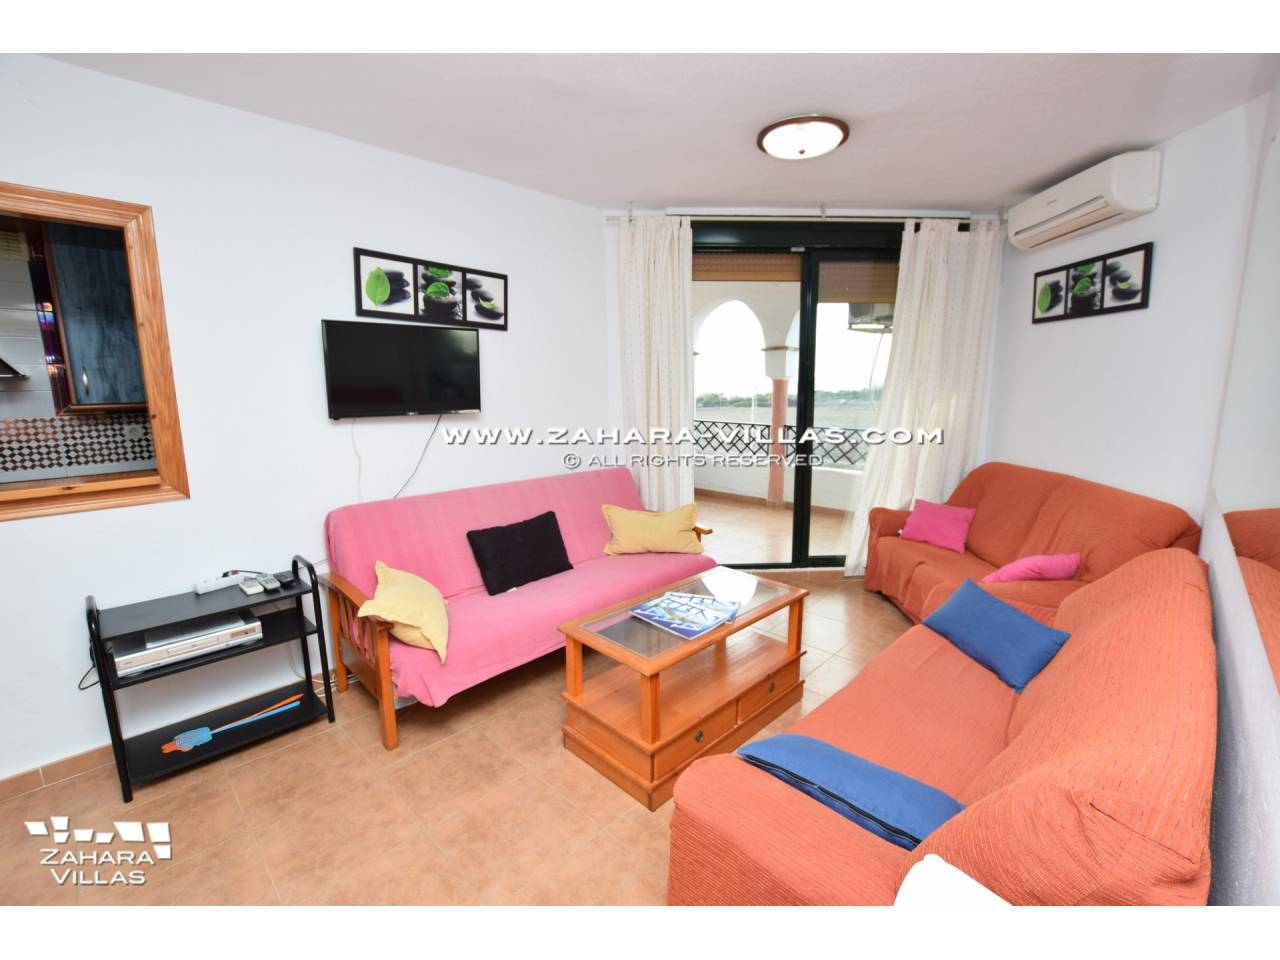 Imagen 10 de Penthouse for sale in Zahara de los Atunes